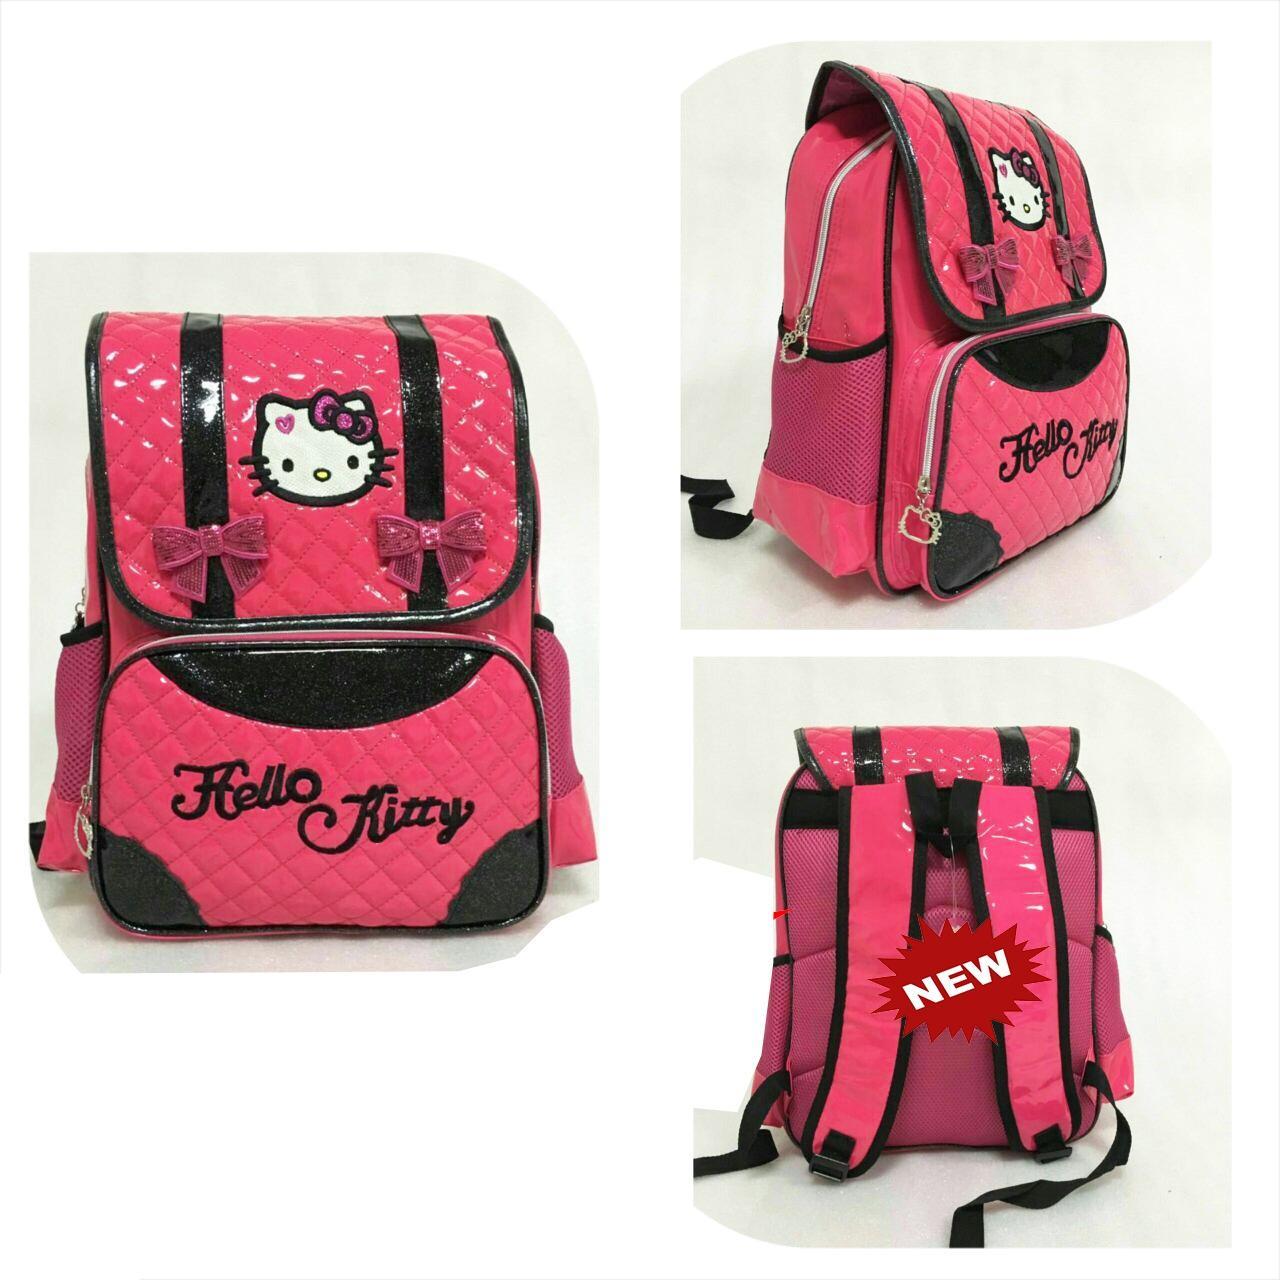 Beli Onlan Tas Ransel Anak Sd Bahan Anti Air Import Hello Kitty Karakter Anak Perempuan Cantik Onlan